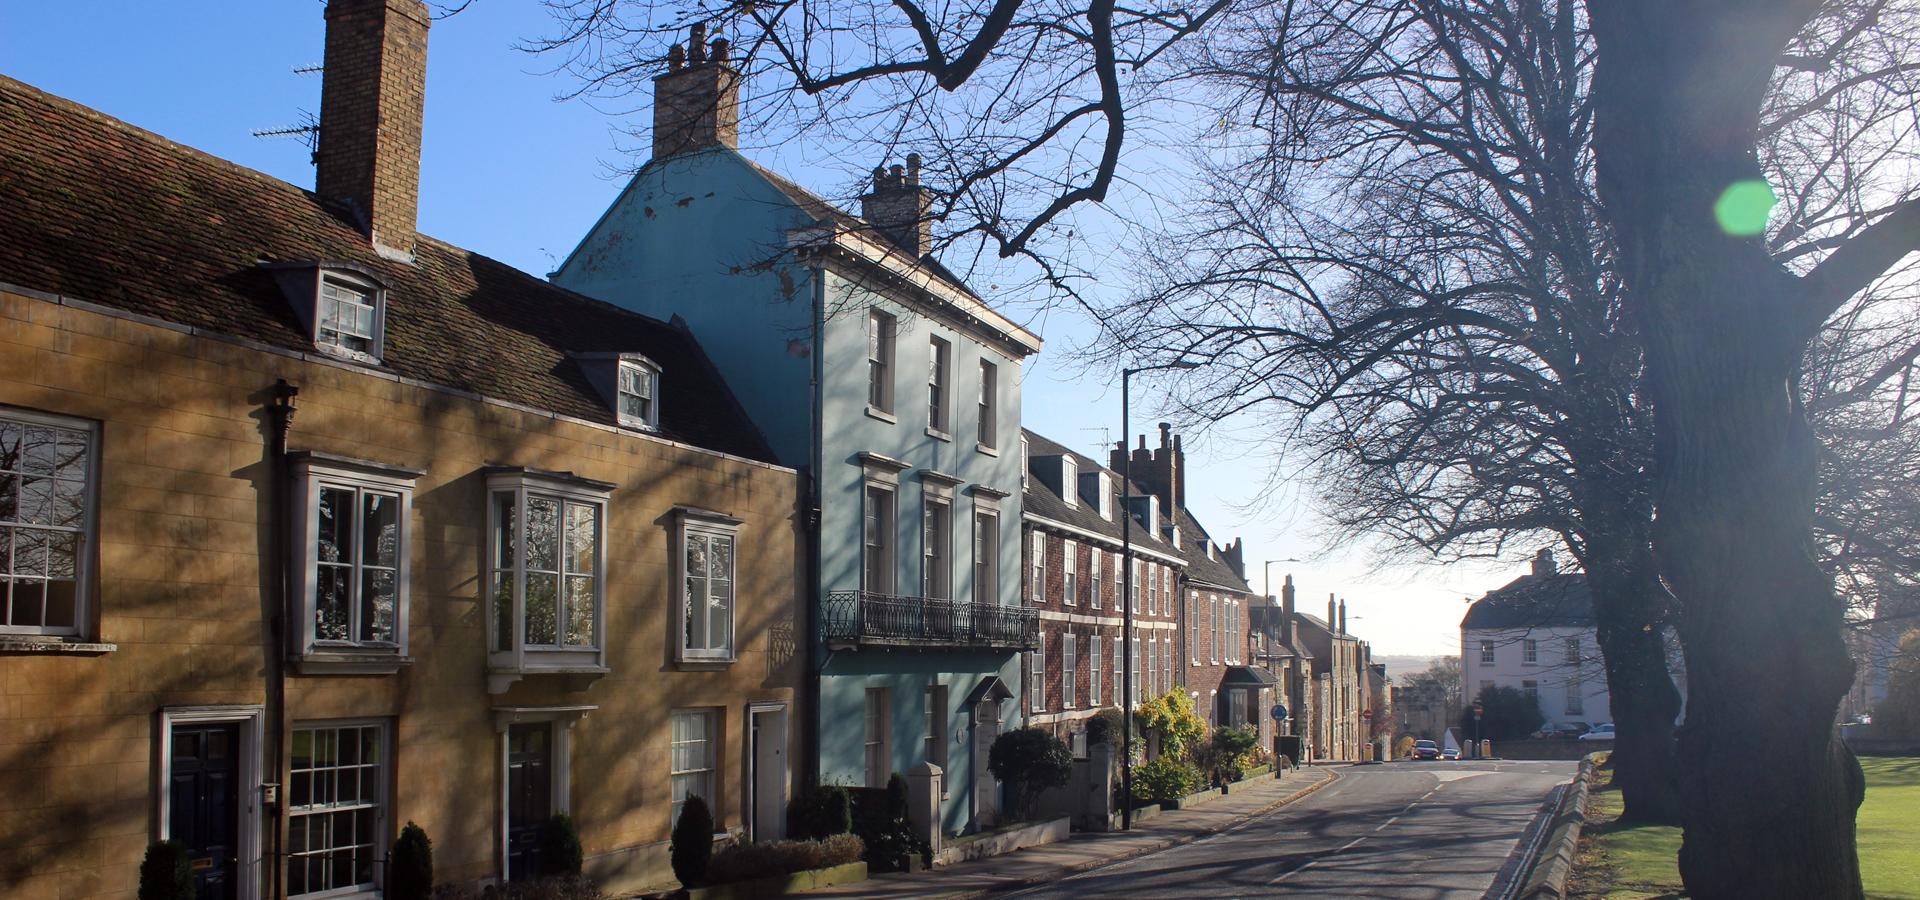 Lincoln, Lincolnshire, England, Great Britain